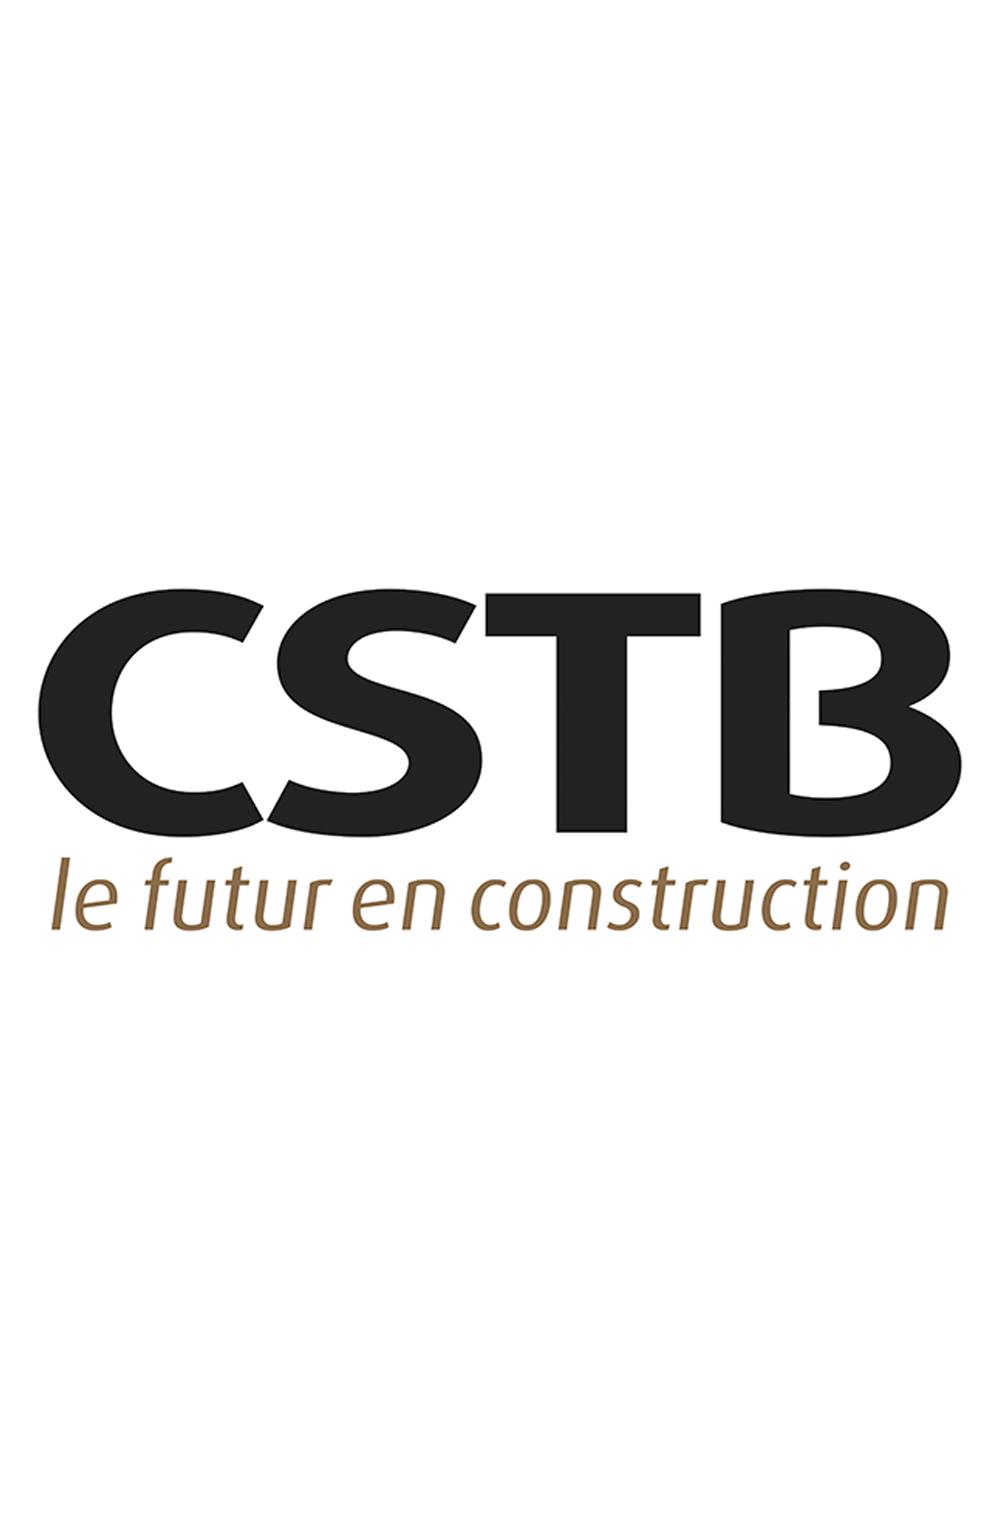 CSTB Pass Vec